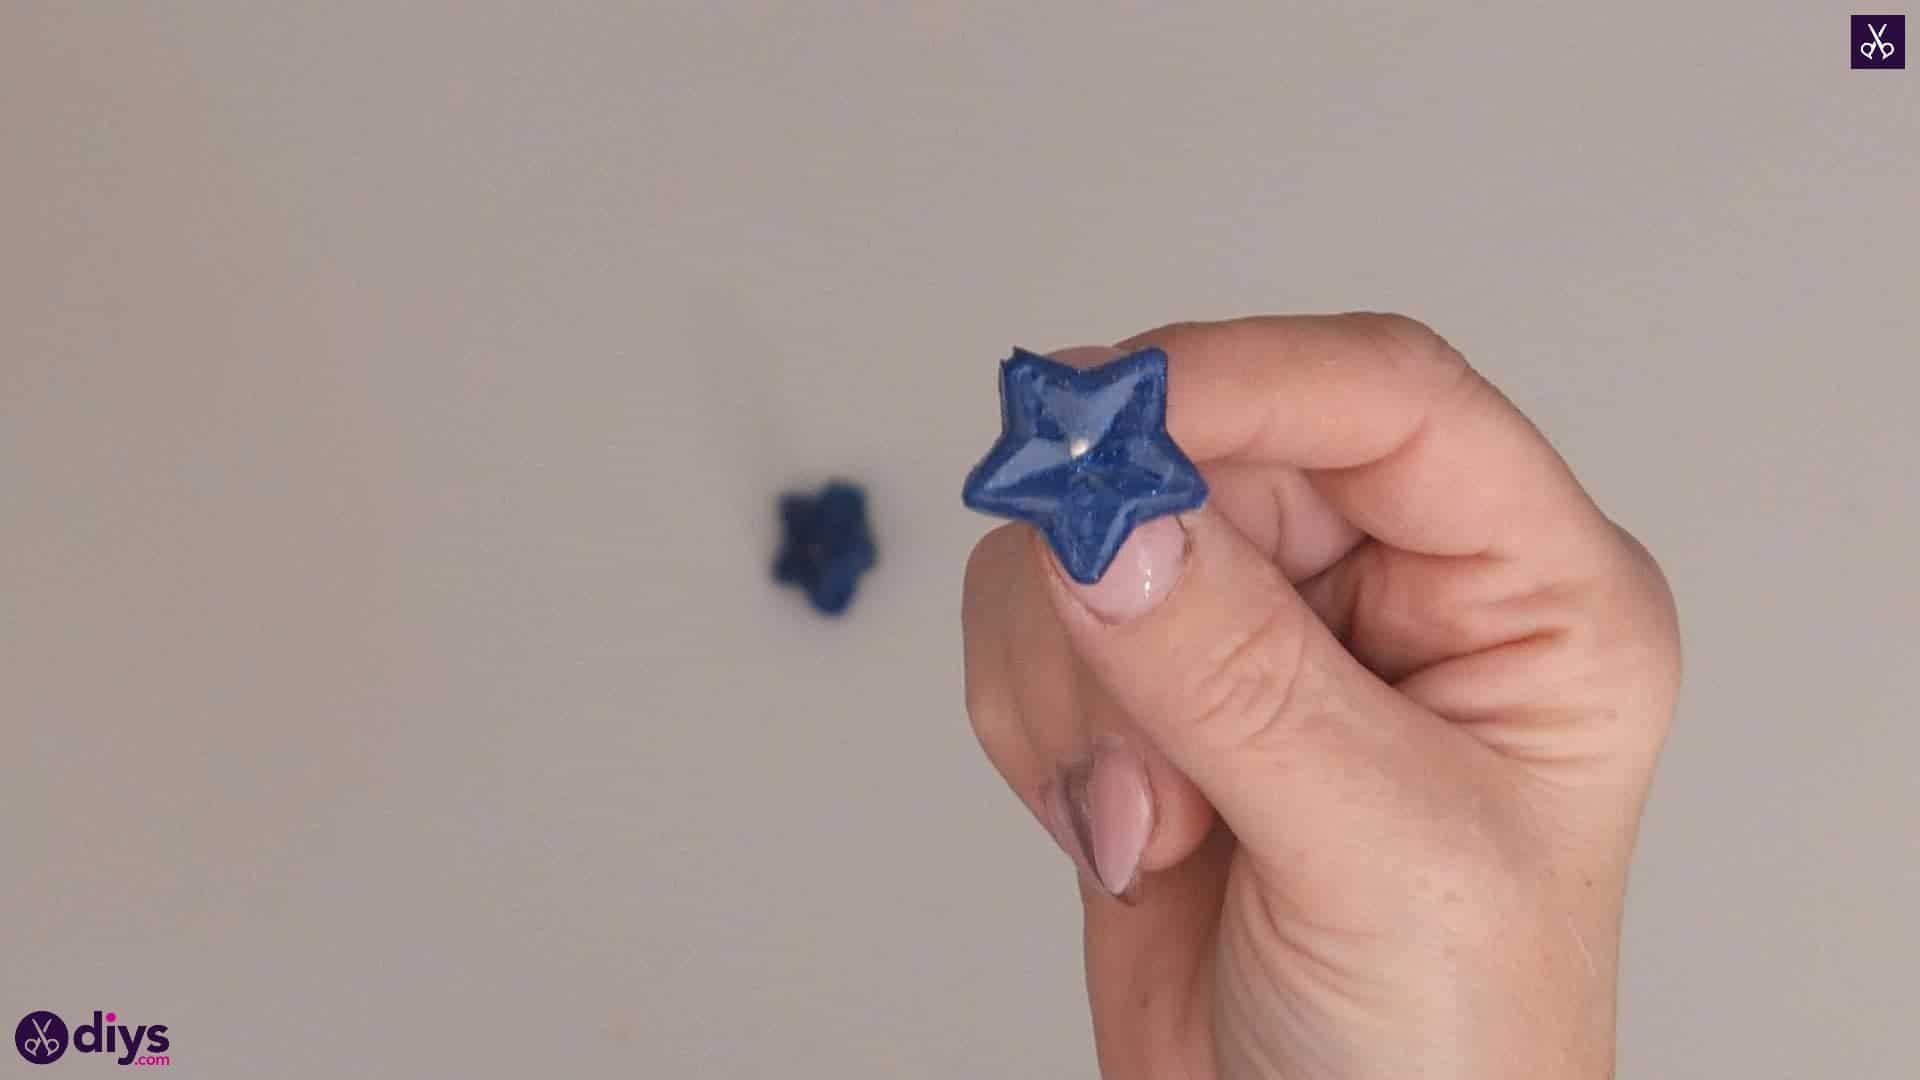 Diy hot glue star earrings step 4c